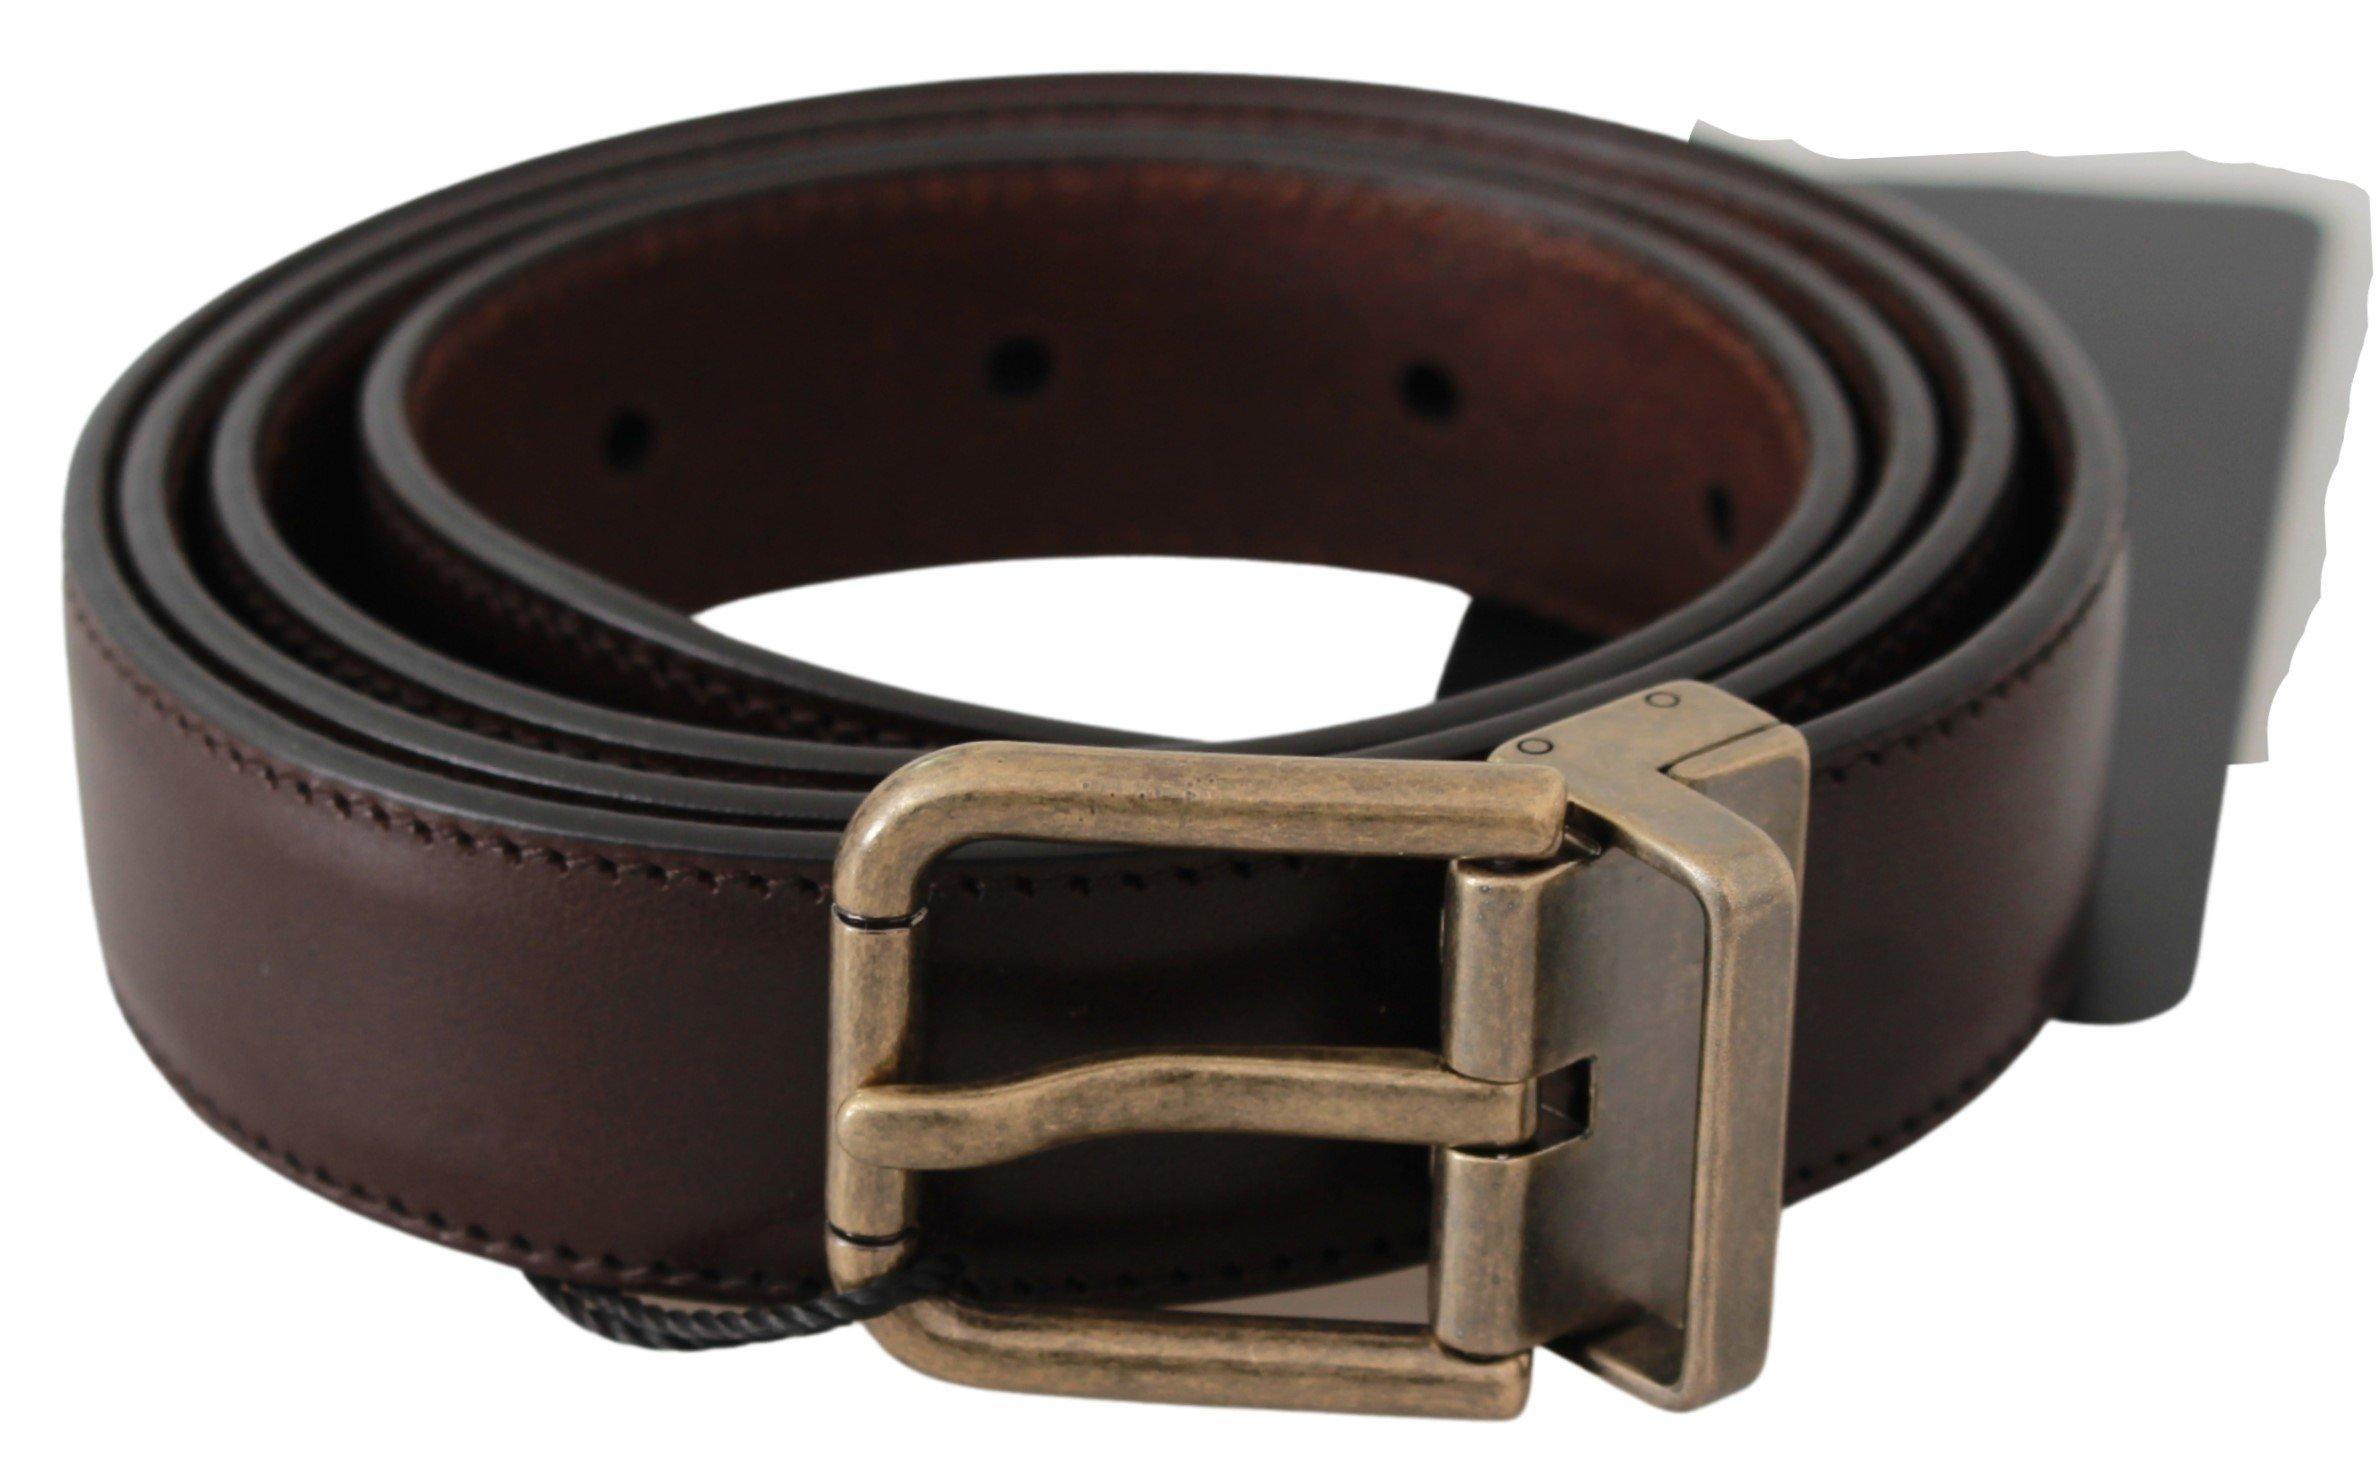 Dolce & Gabbana Men's Leather Gold Buckle Mens Belt Brown BEL60633 - 100 cm / 40 Inches